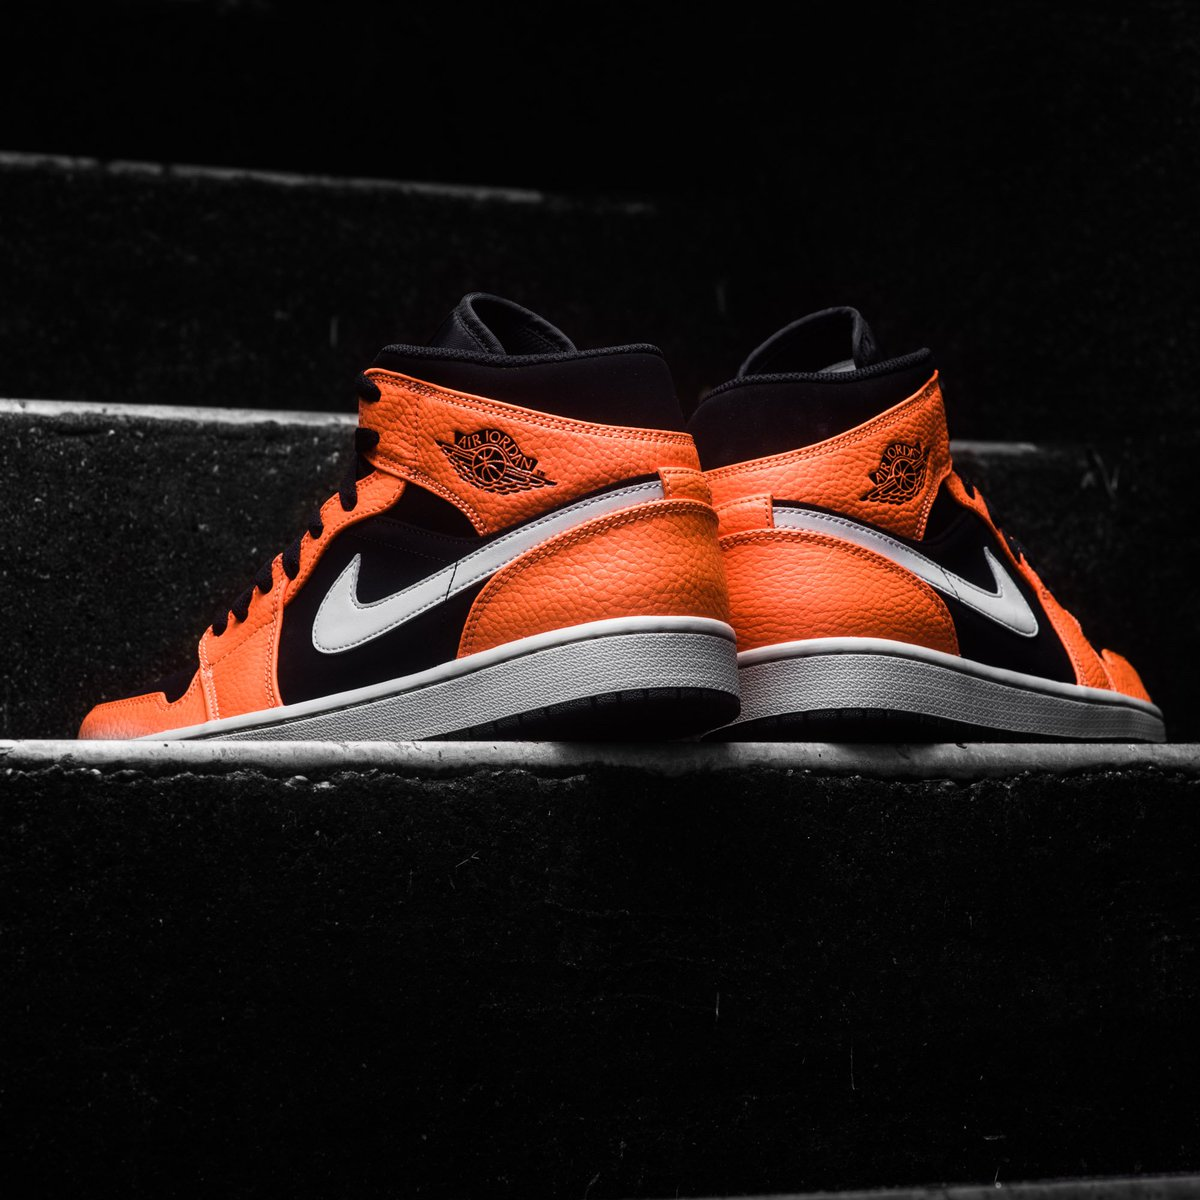 161990b3df6 Now Available    Air Jordan 1 Mid - Black Cone Light Bone     https   sneakerpolitics.com products air-jordan-1-mid-black-cone-light-bone  …pic.twitter.com  ...